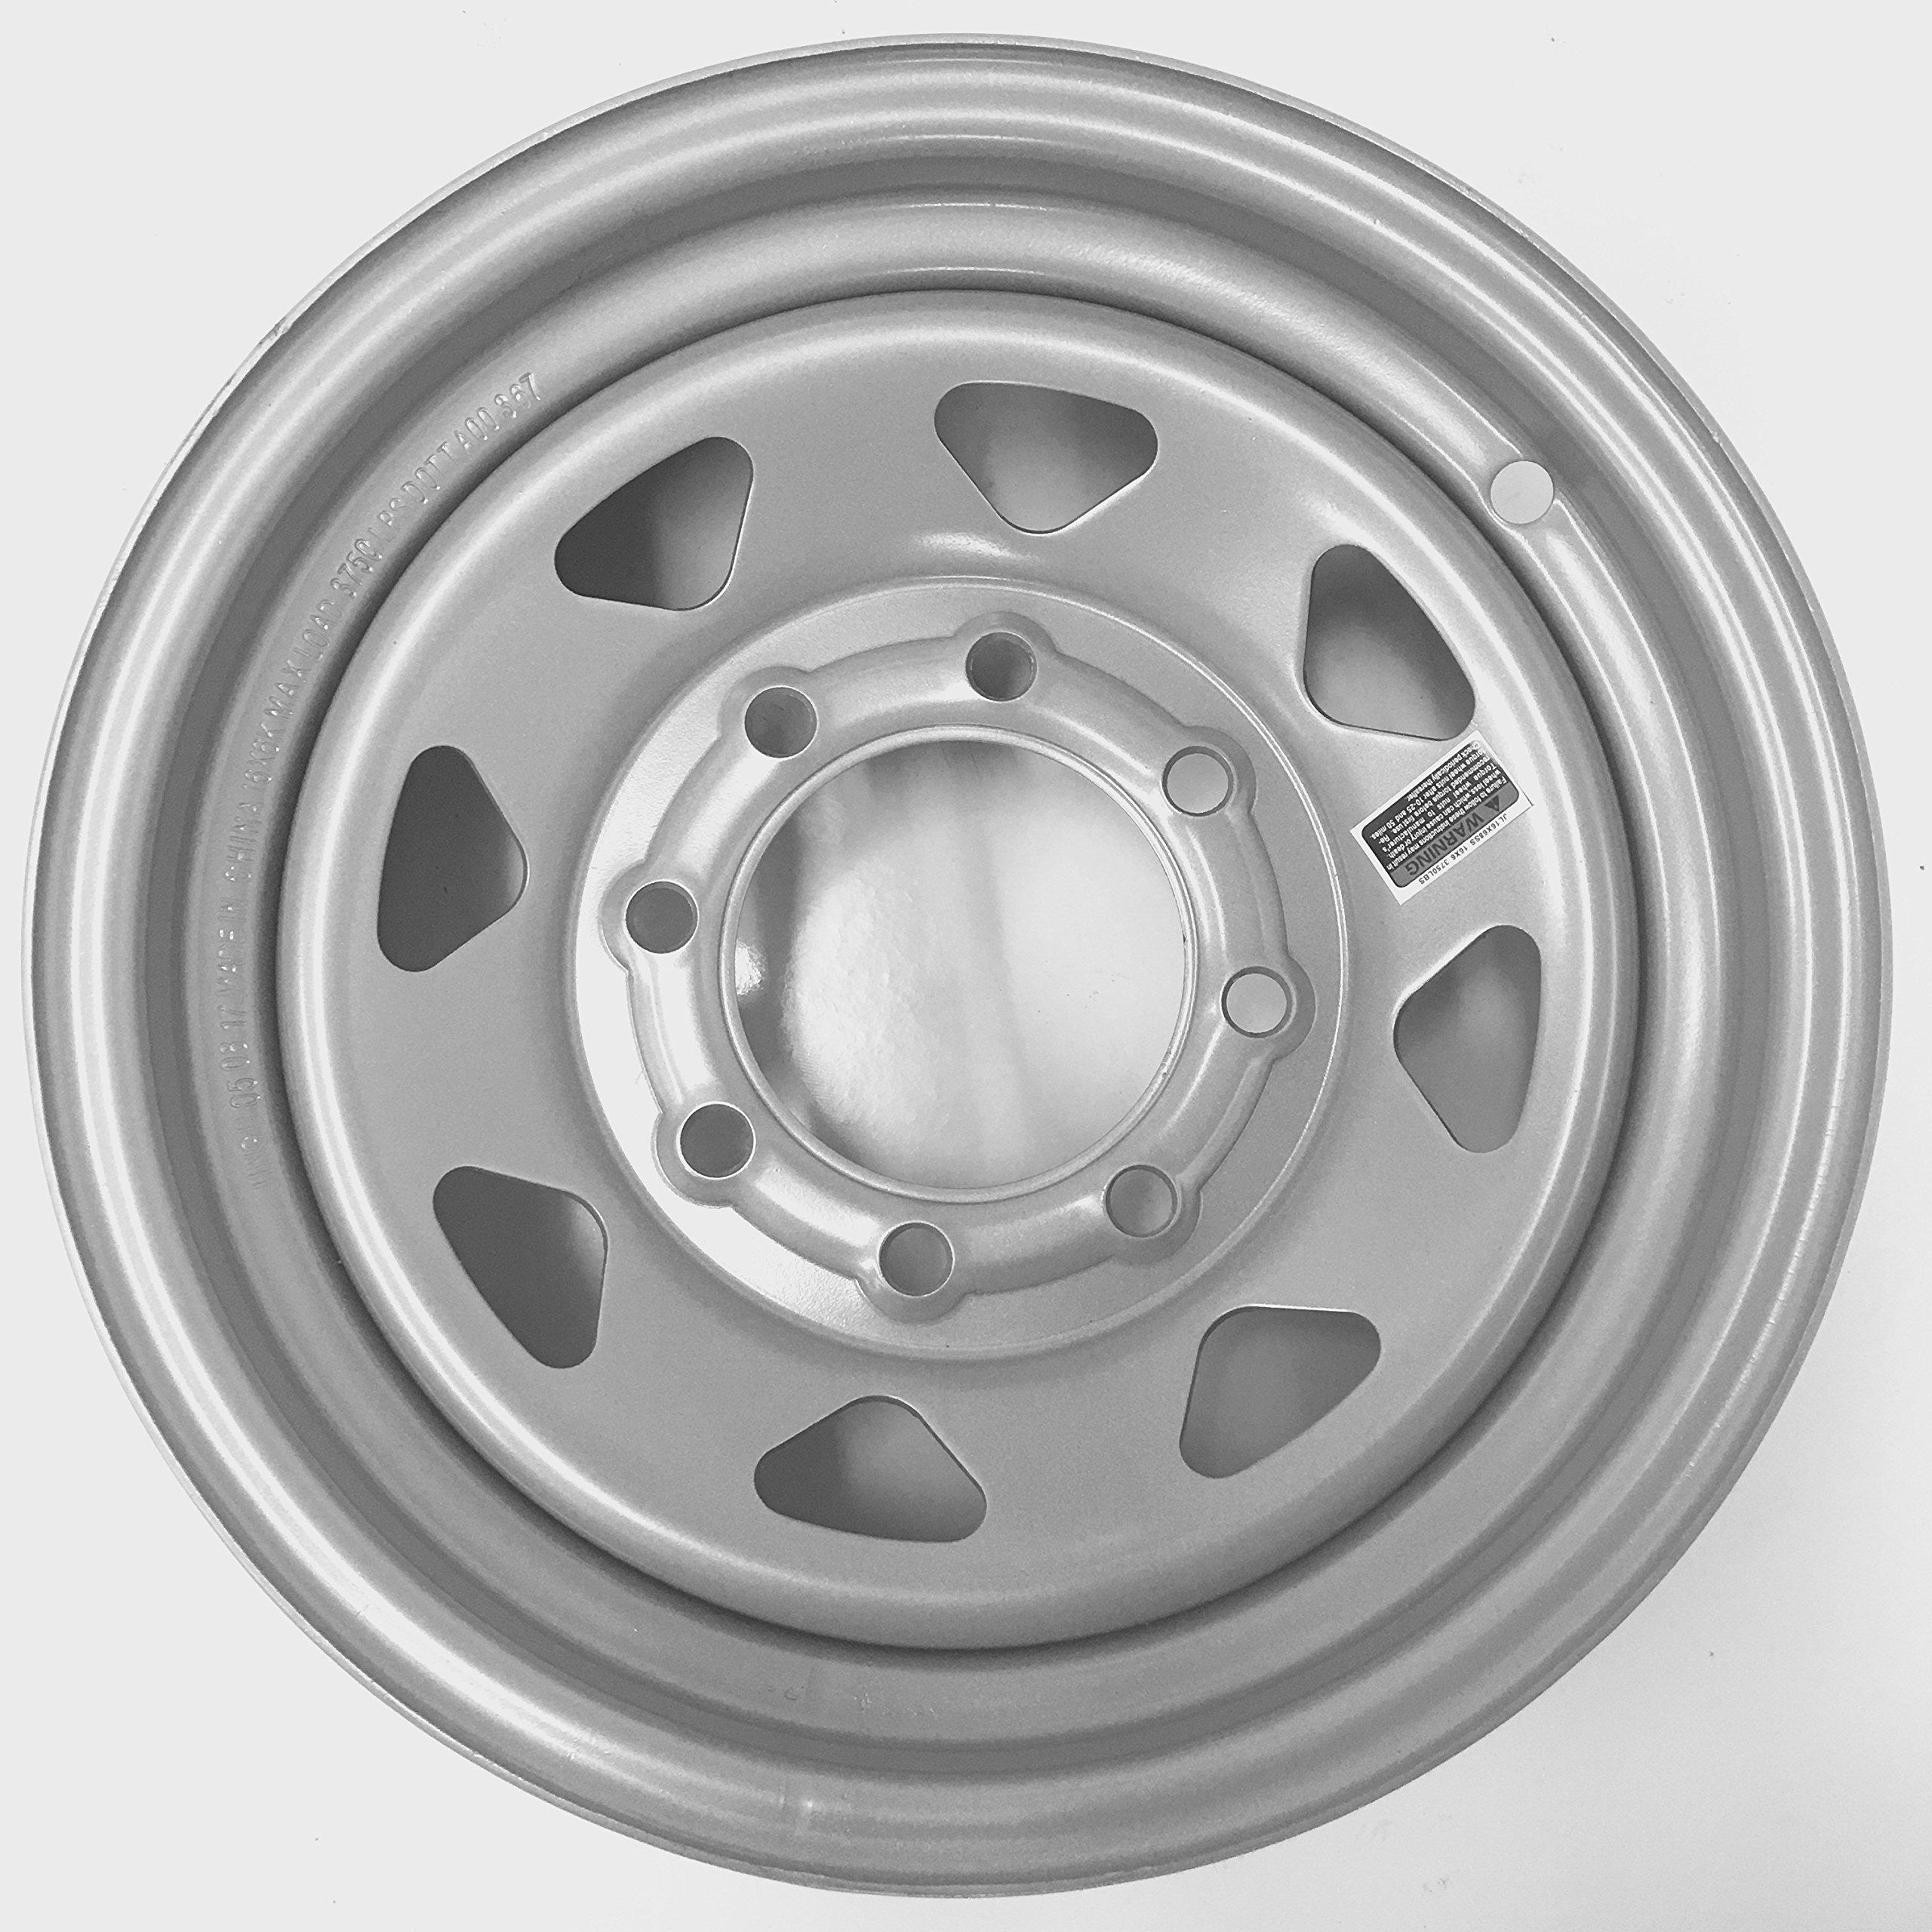 "eCustomRim Trailer Wheel Silver Rim 16 x 6 Spoke Style (8 Lug On 6.5"") 4.90"" Center Bore"